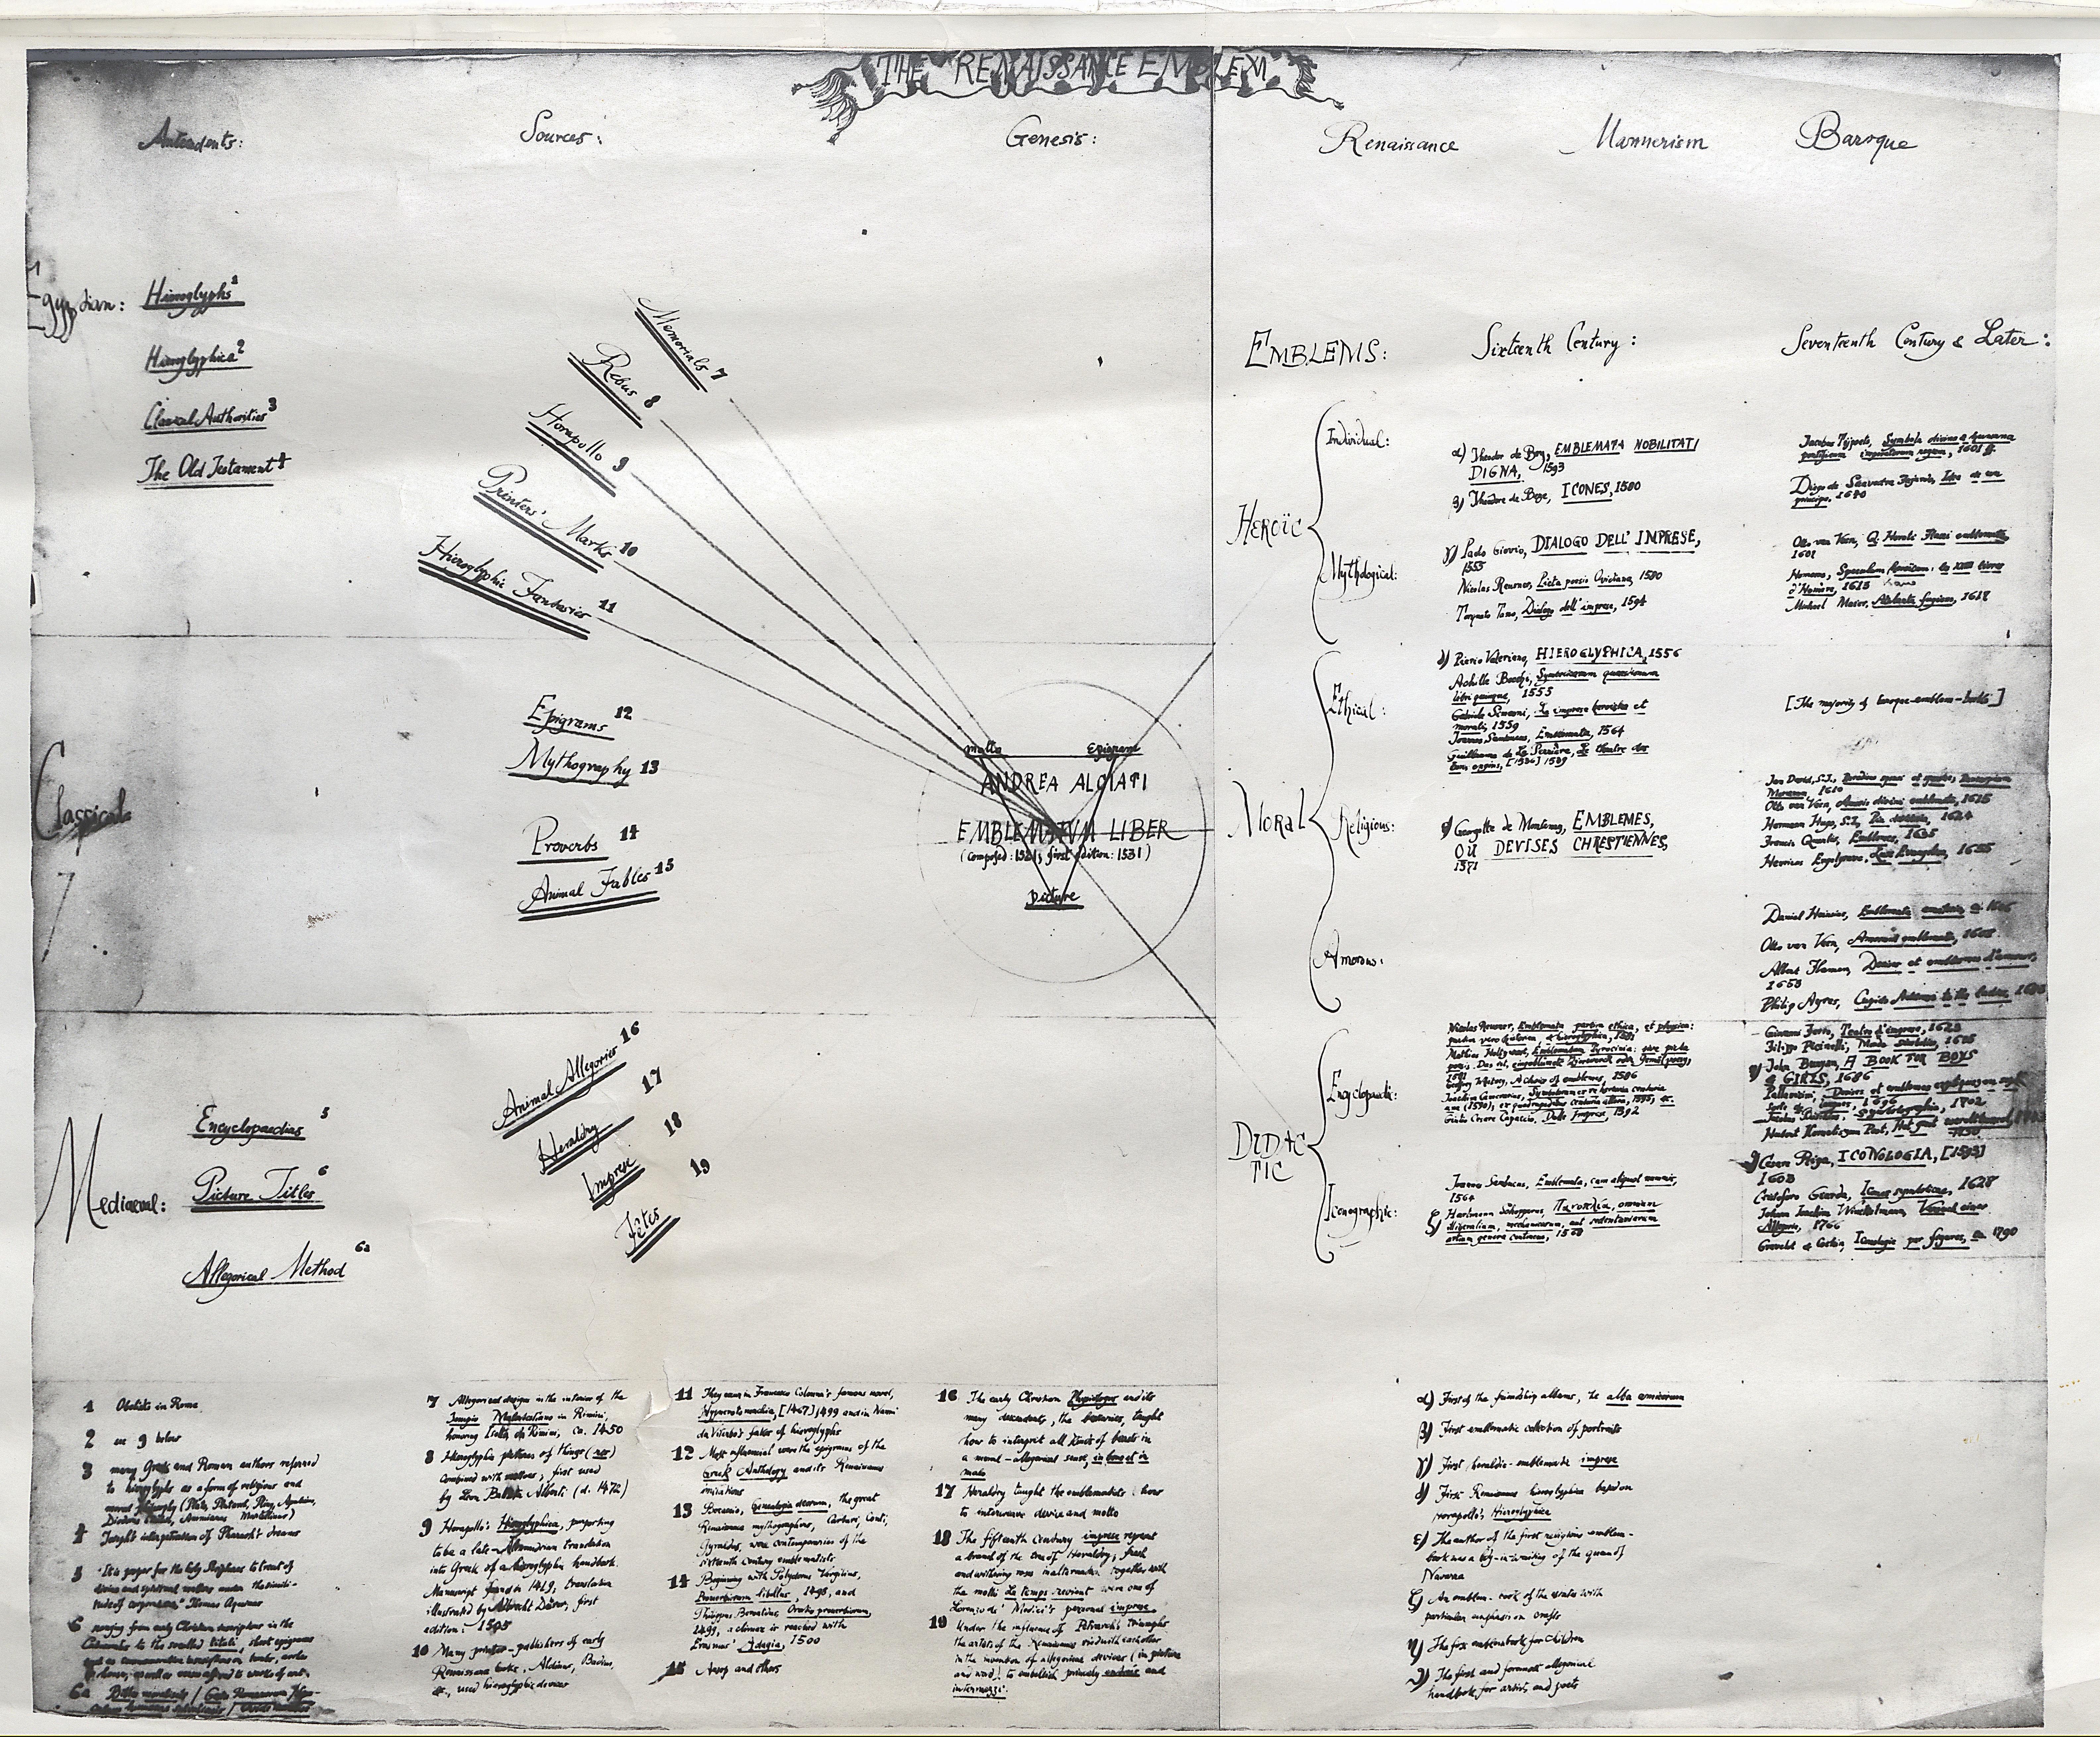 http://blogs.princeton.edu/rarebooks/images/Hecksher-Ren-emblem-chart0.jpg